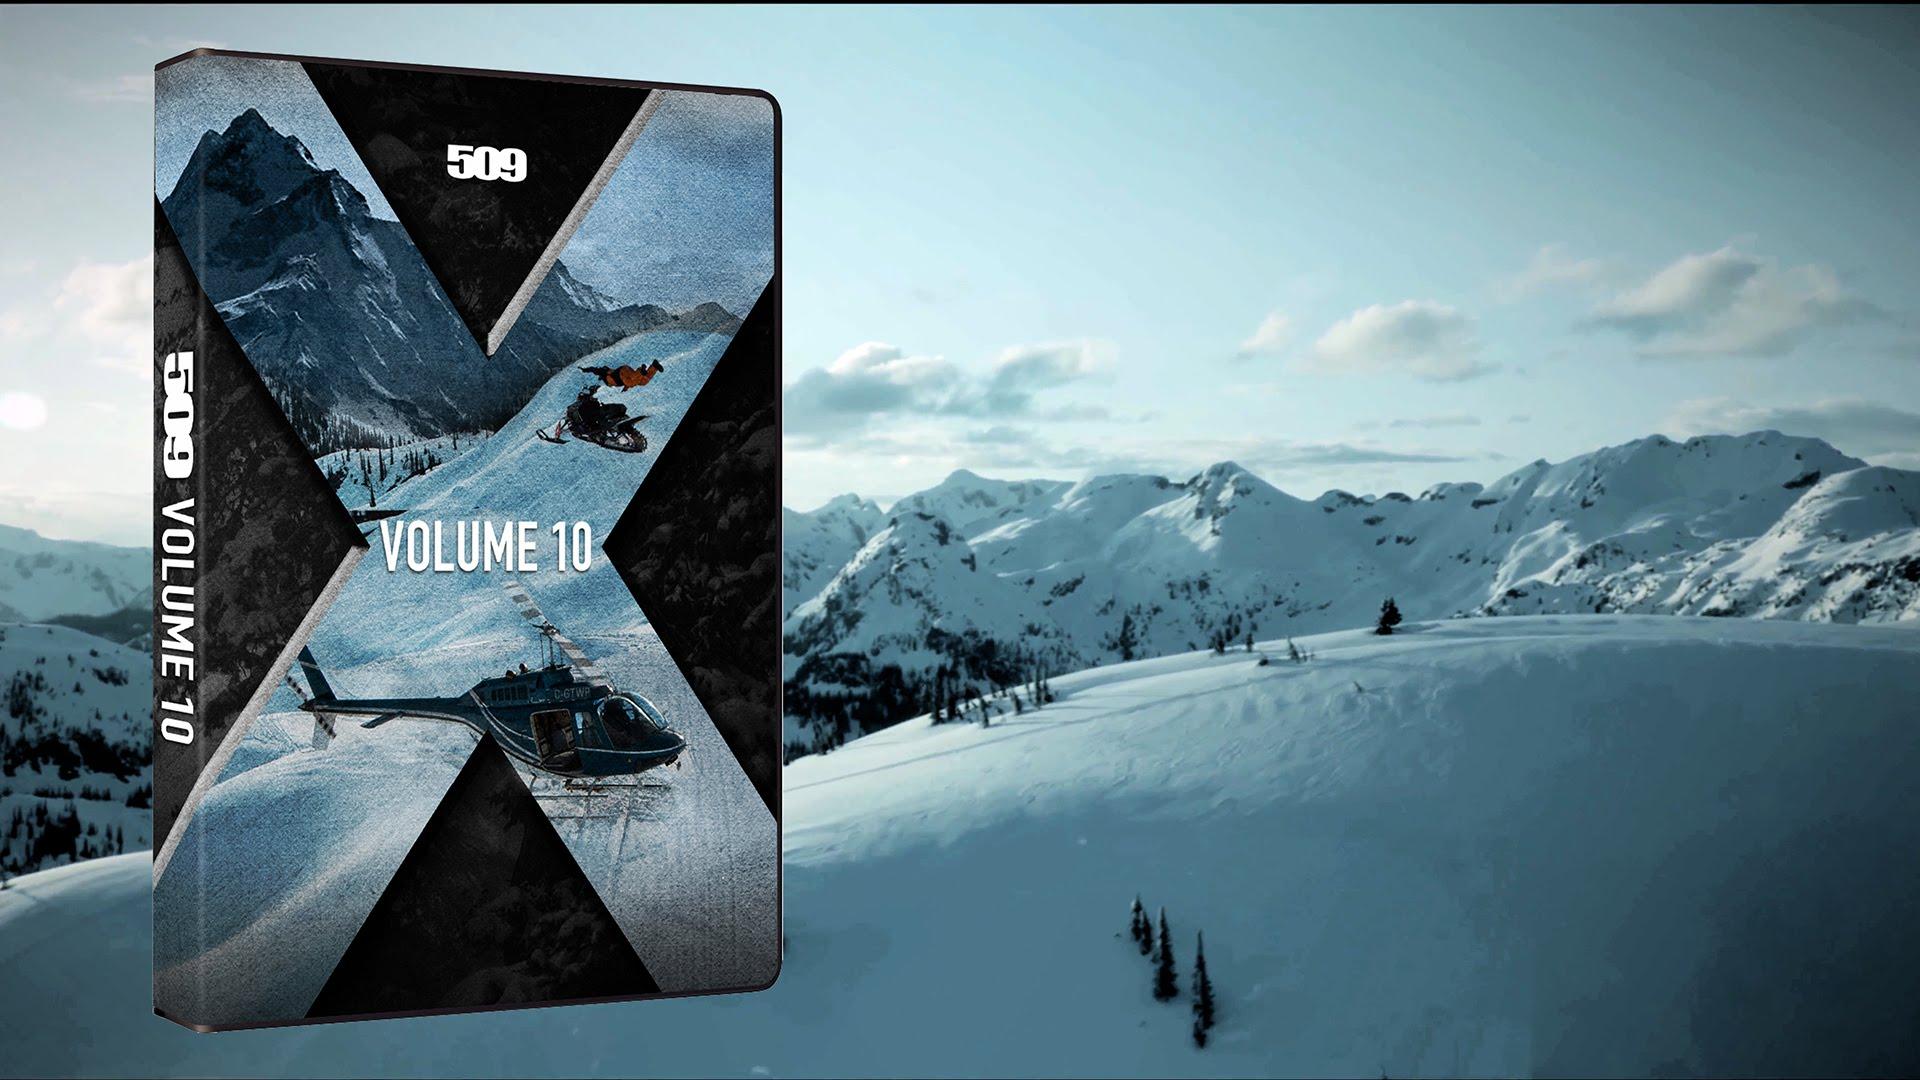 509 Volume 10 - Official Teaser 3